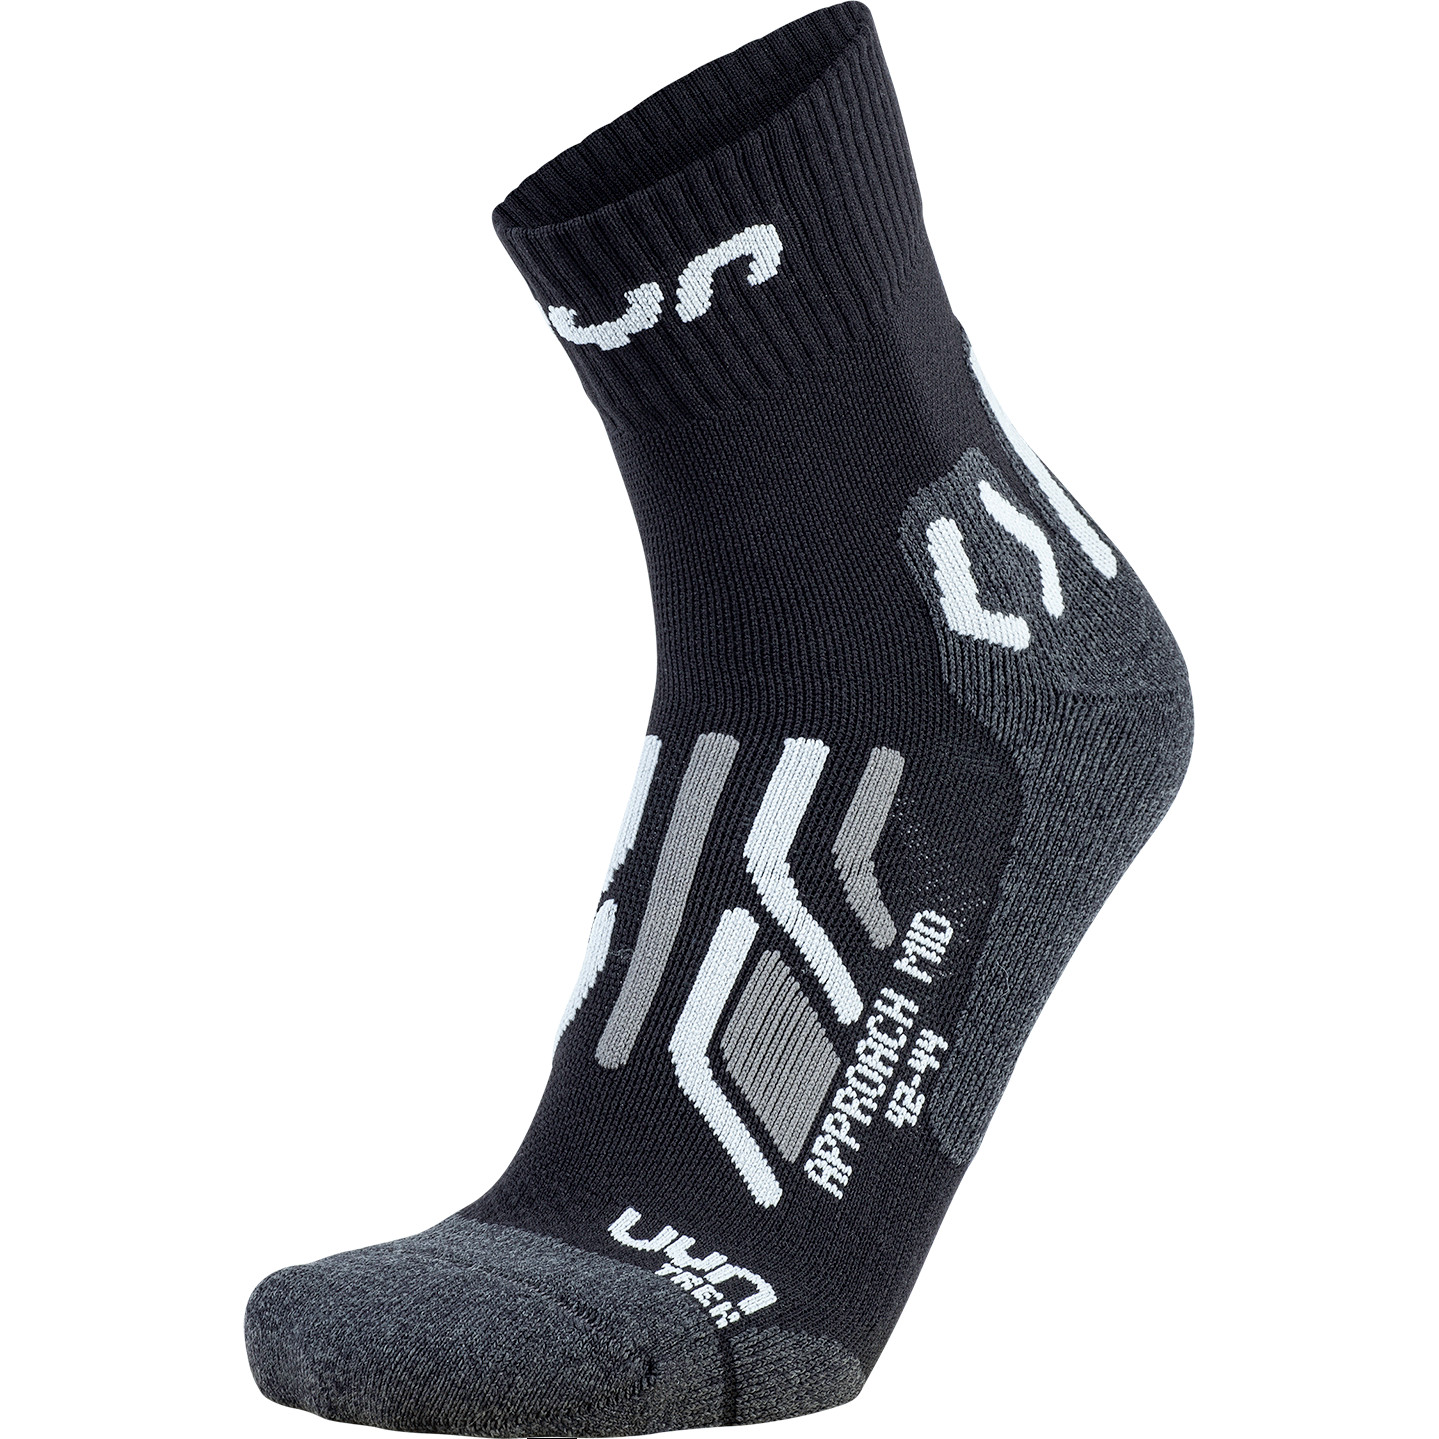 Image of UYN Man Trekking Approach Mid Cut Socks - Black/Grey